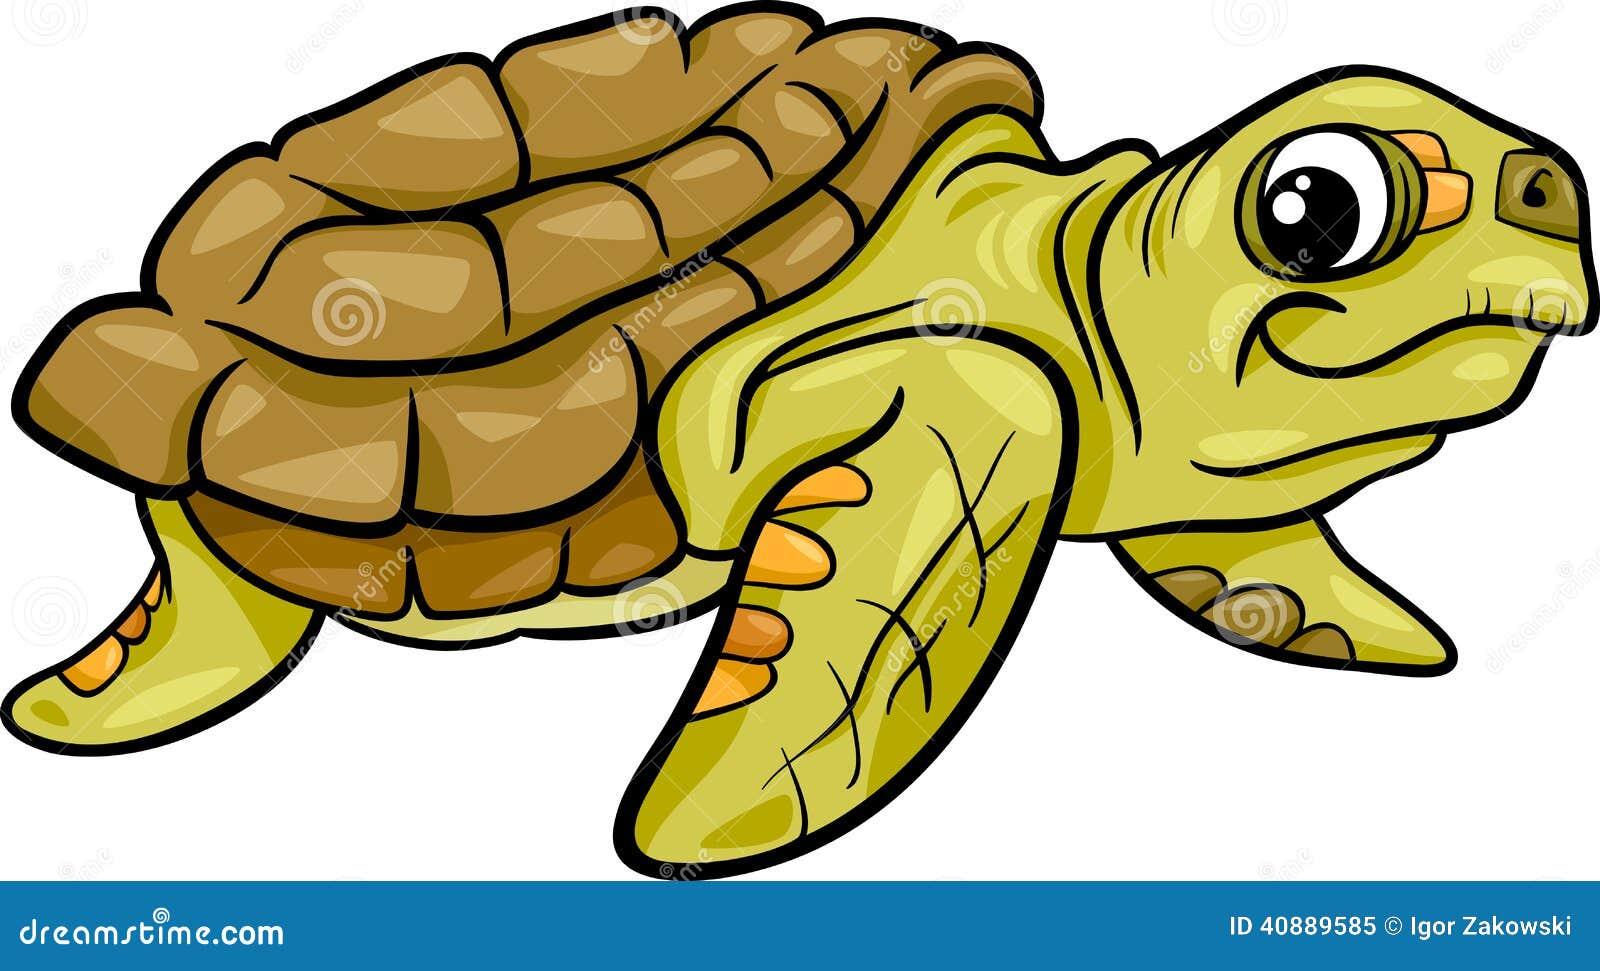 Sea Turtle Animal Cartoon Illustration Stock Vector - Image: 40889585